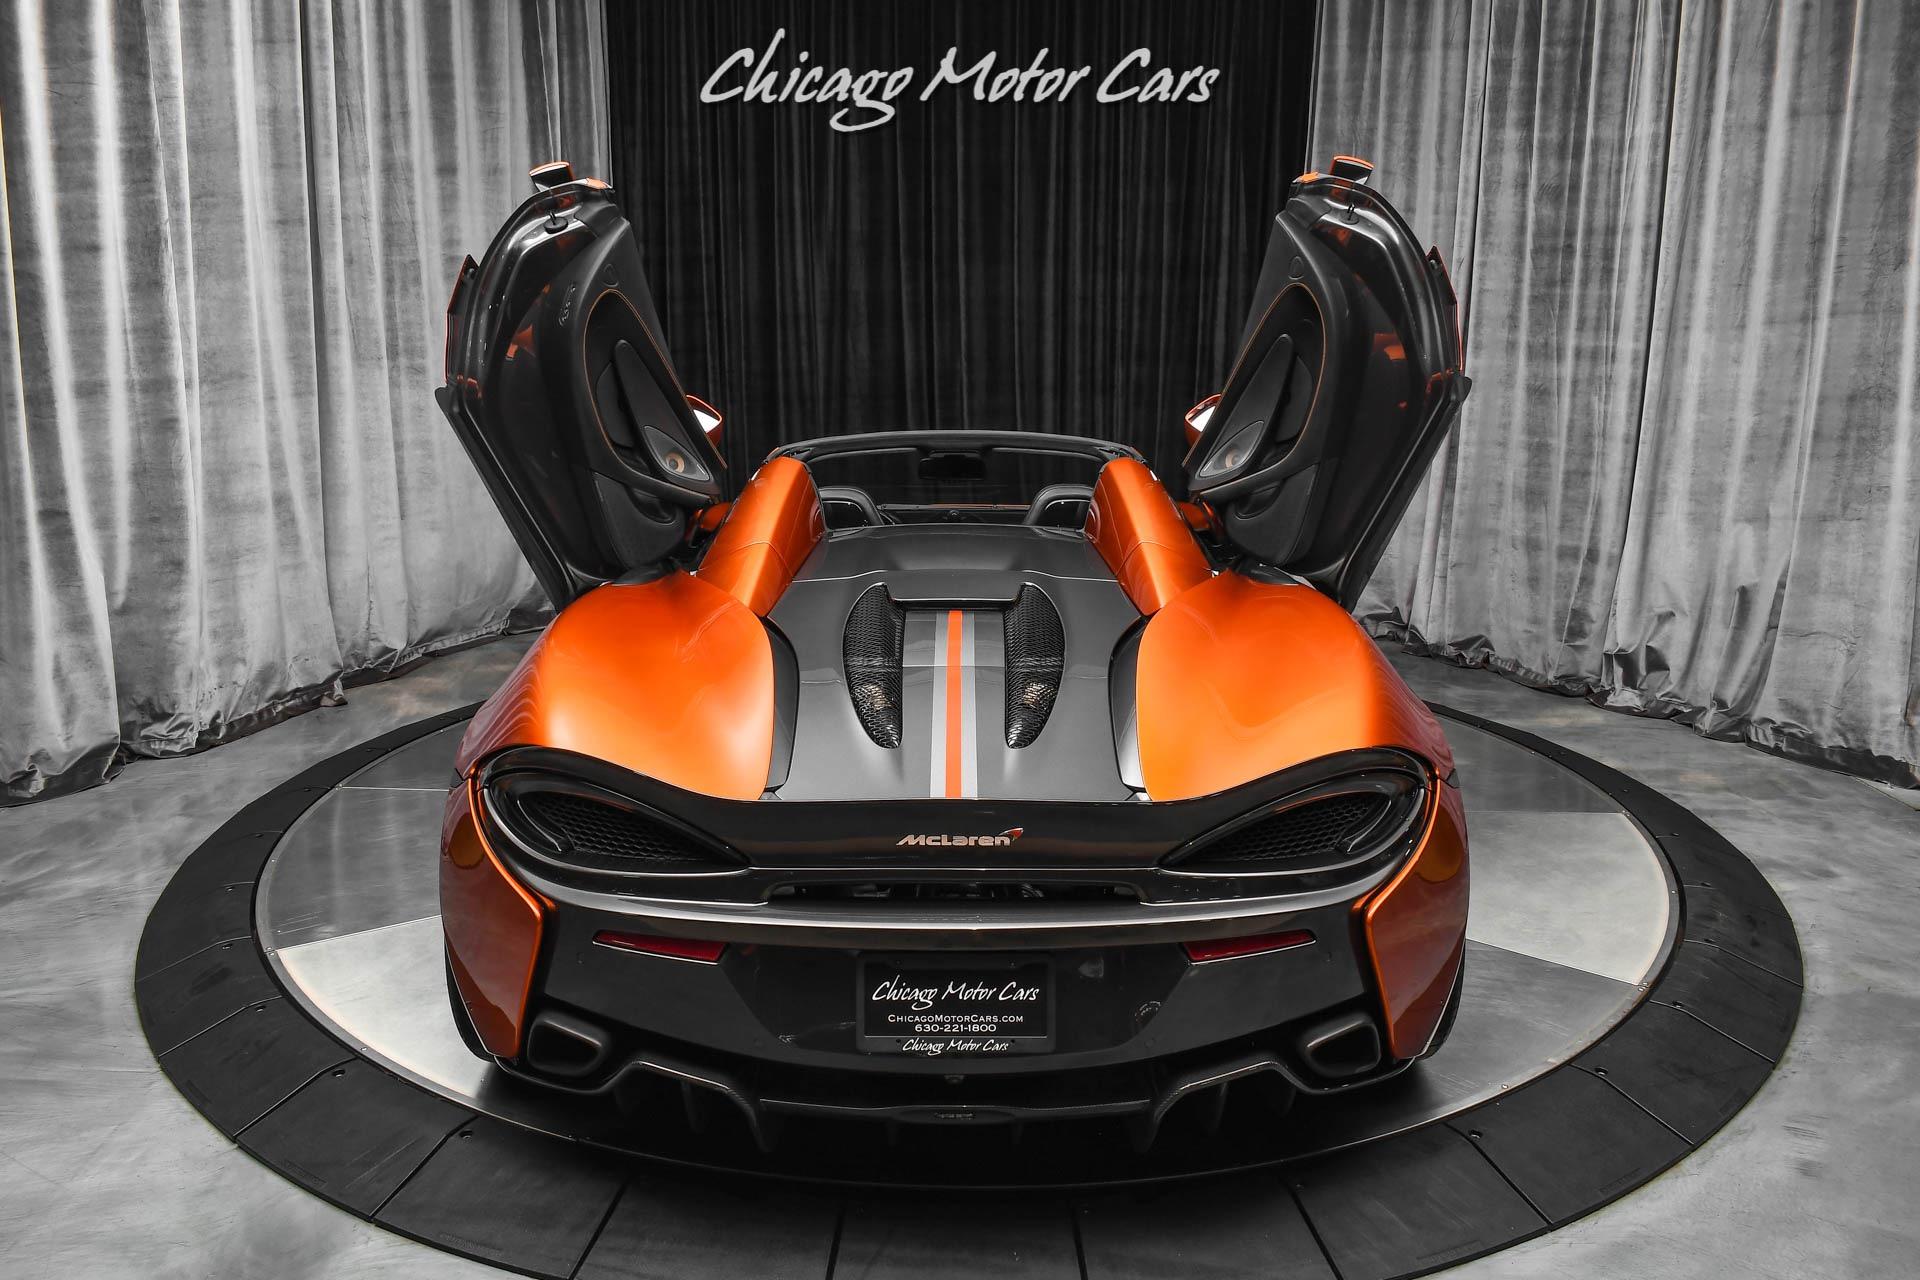 Used-2018-McLaren-570S-Spider-Convertible-Only-11k-Miles-Serviced-Volcano-Orange